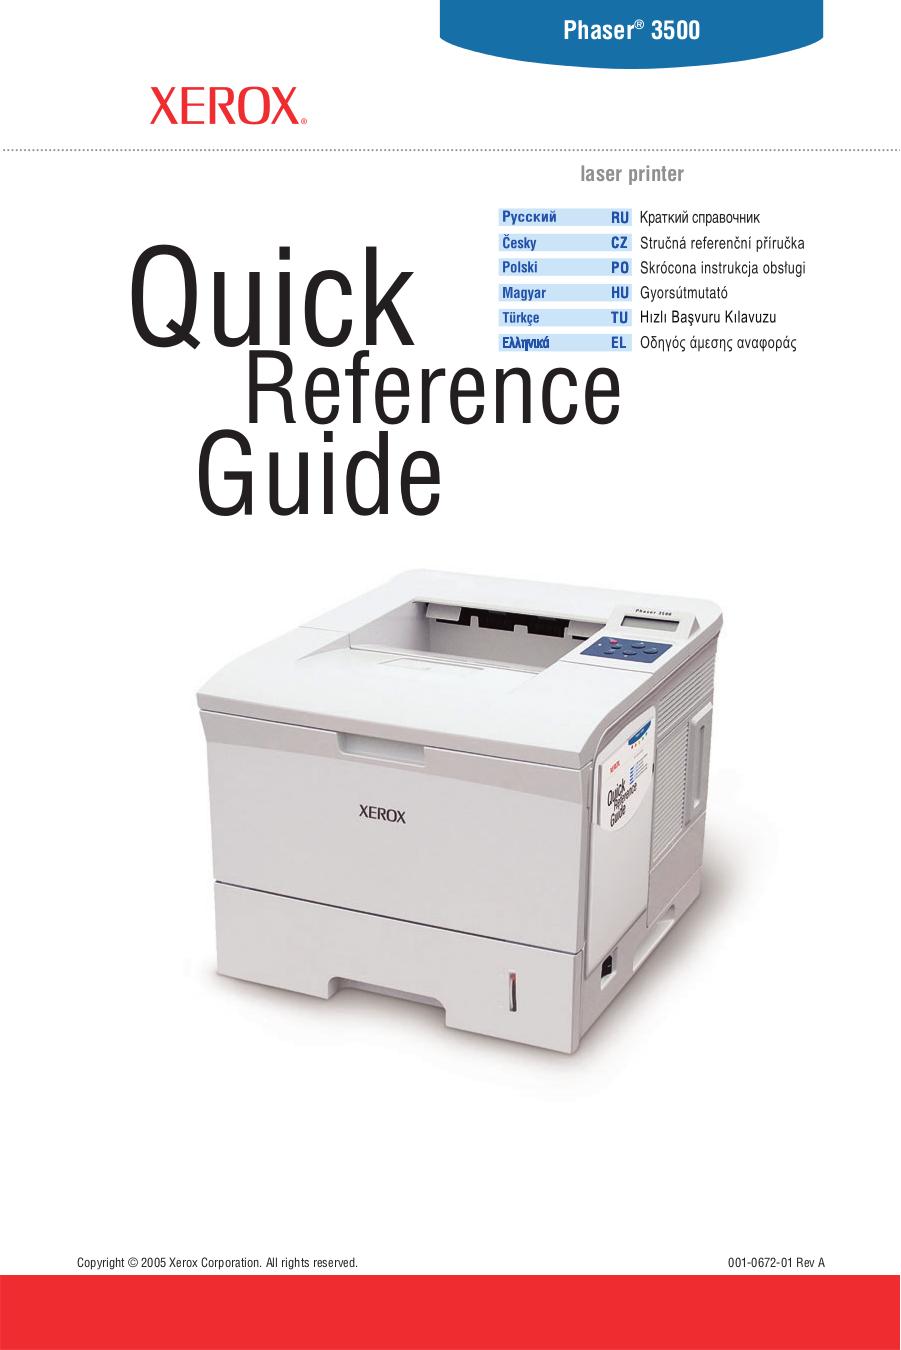 epson workforce wf 7110 Array - download free pdf for xerox phaser 3500  printer manual rh umlib com